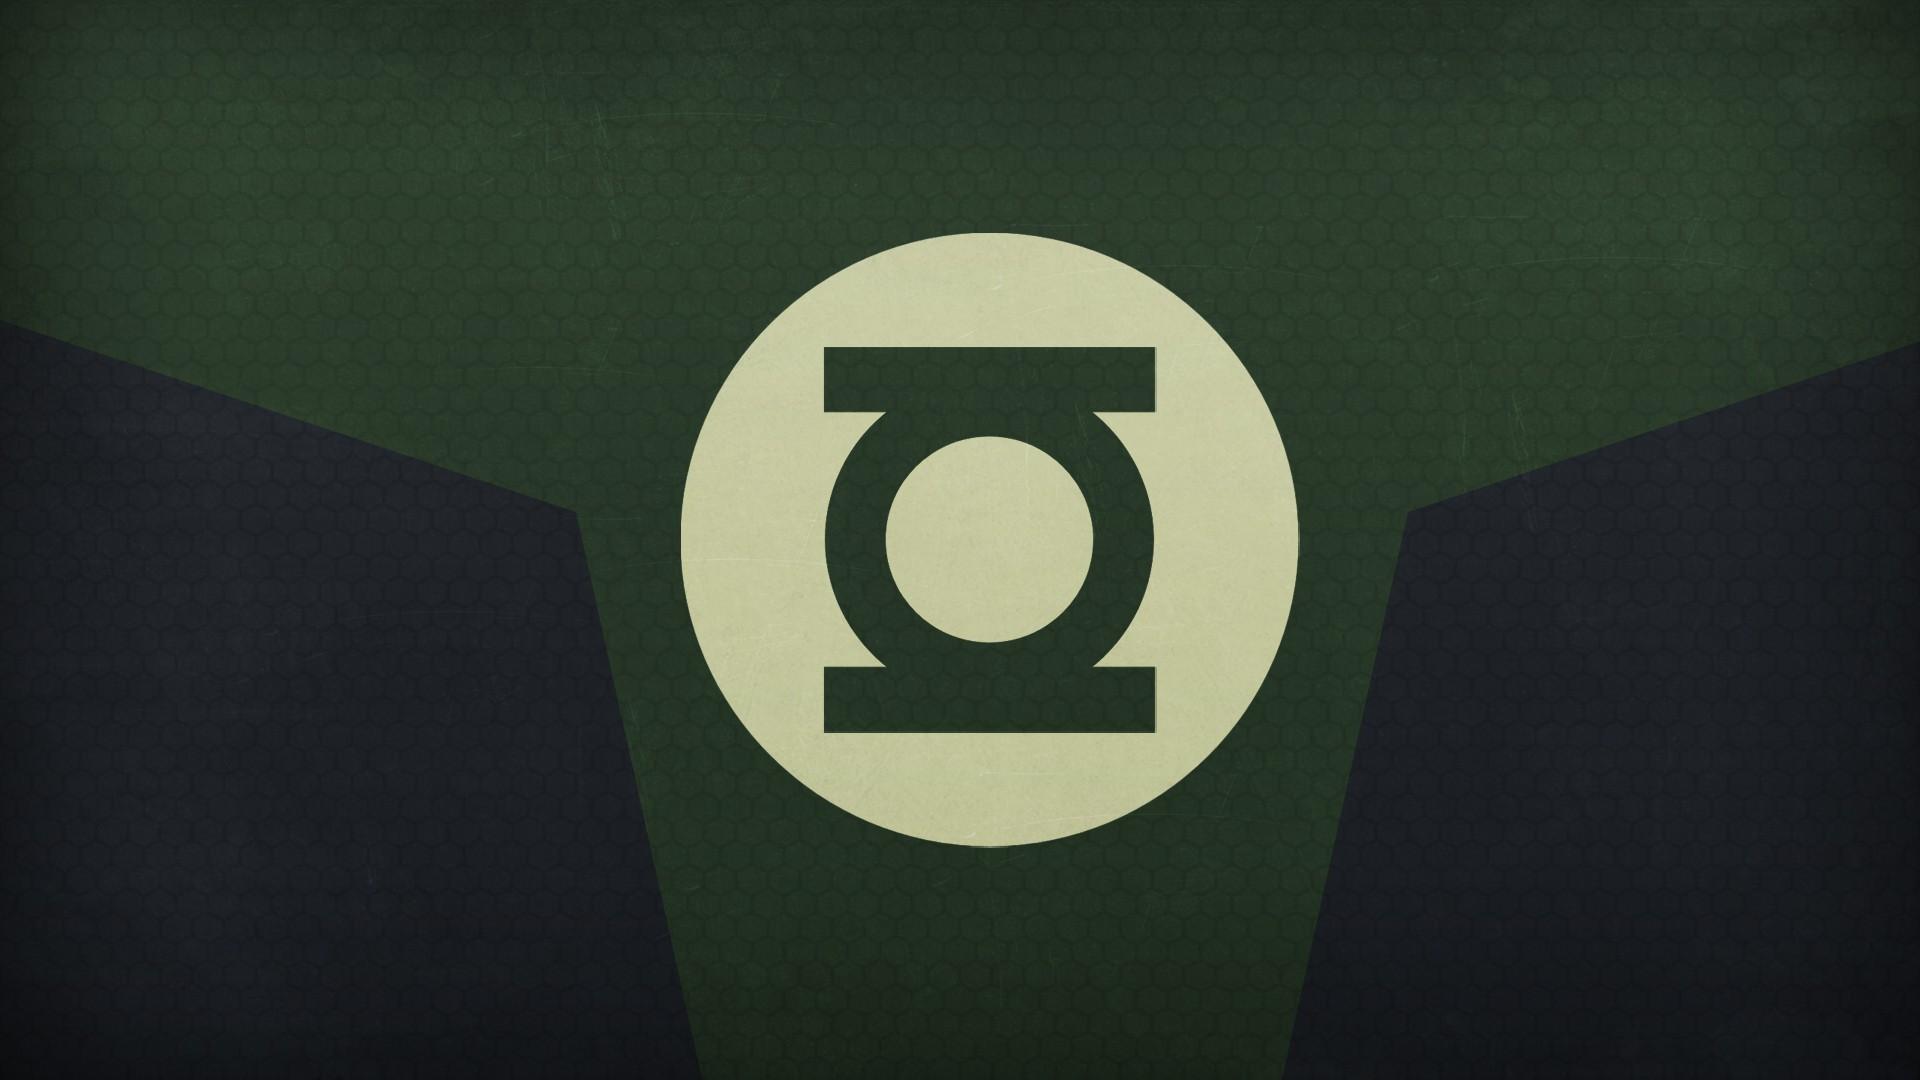 The Green Lantern Wallpapers Group 1920×1200 Green Lantern Wallpaper (34  Wallpapers)   Adorable Wallpapers   Wallpapers   Pinterest   Green lantern  …